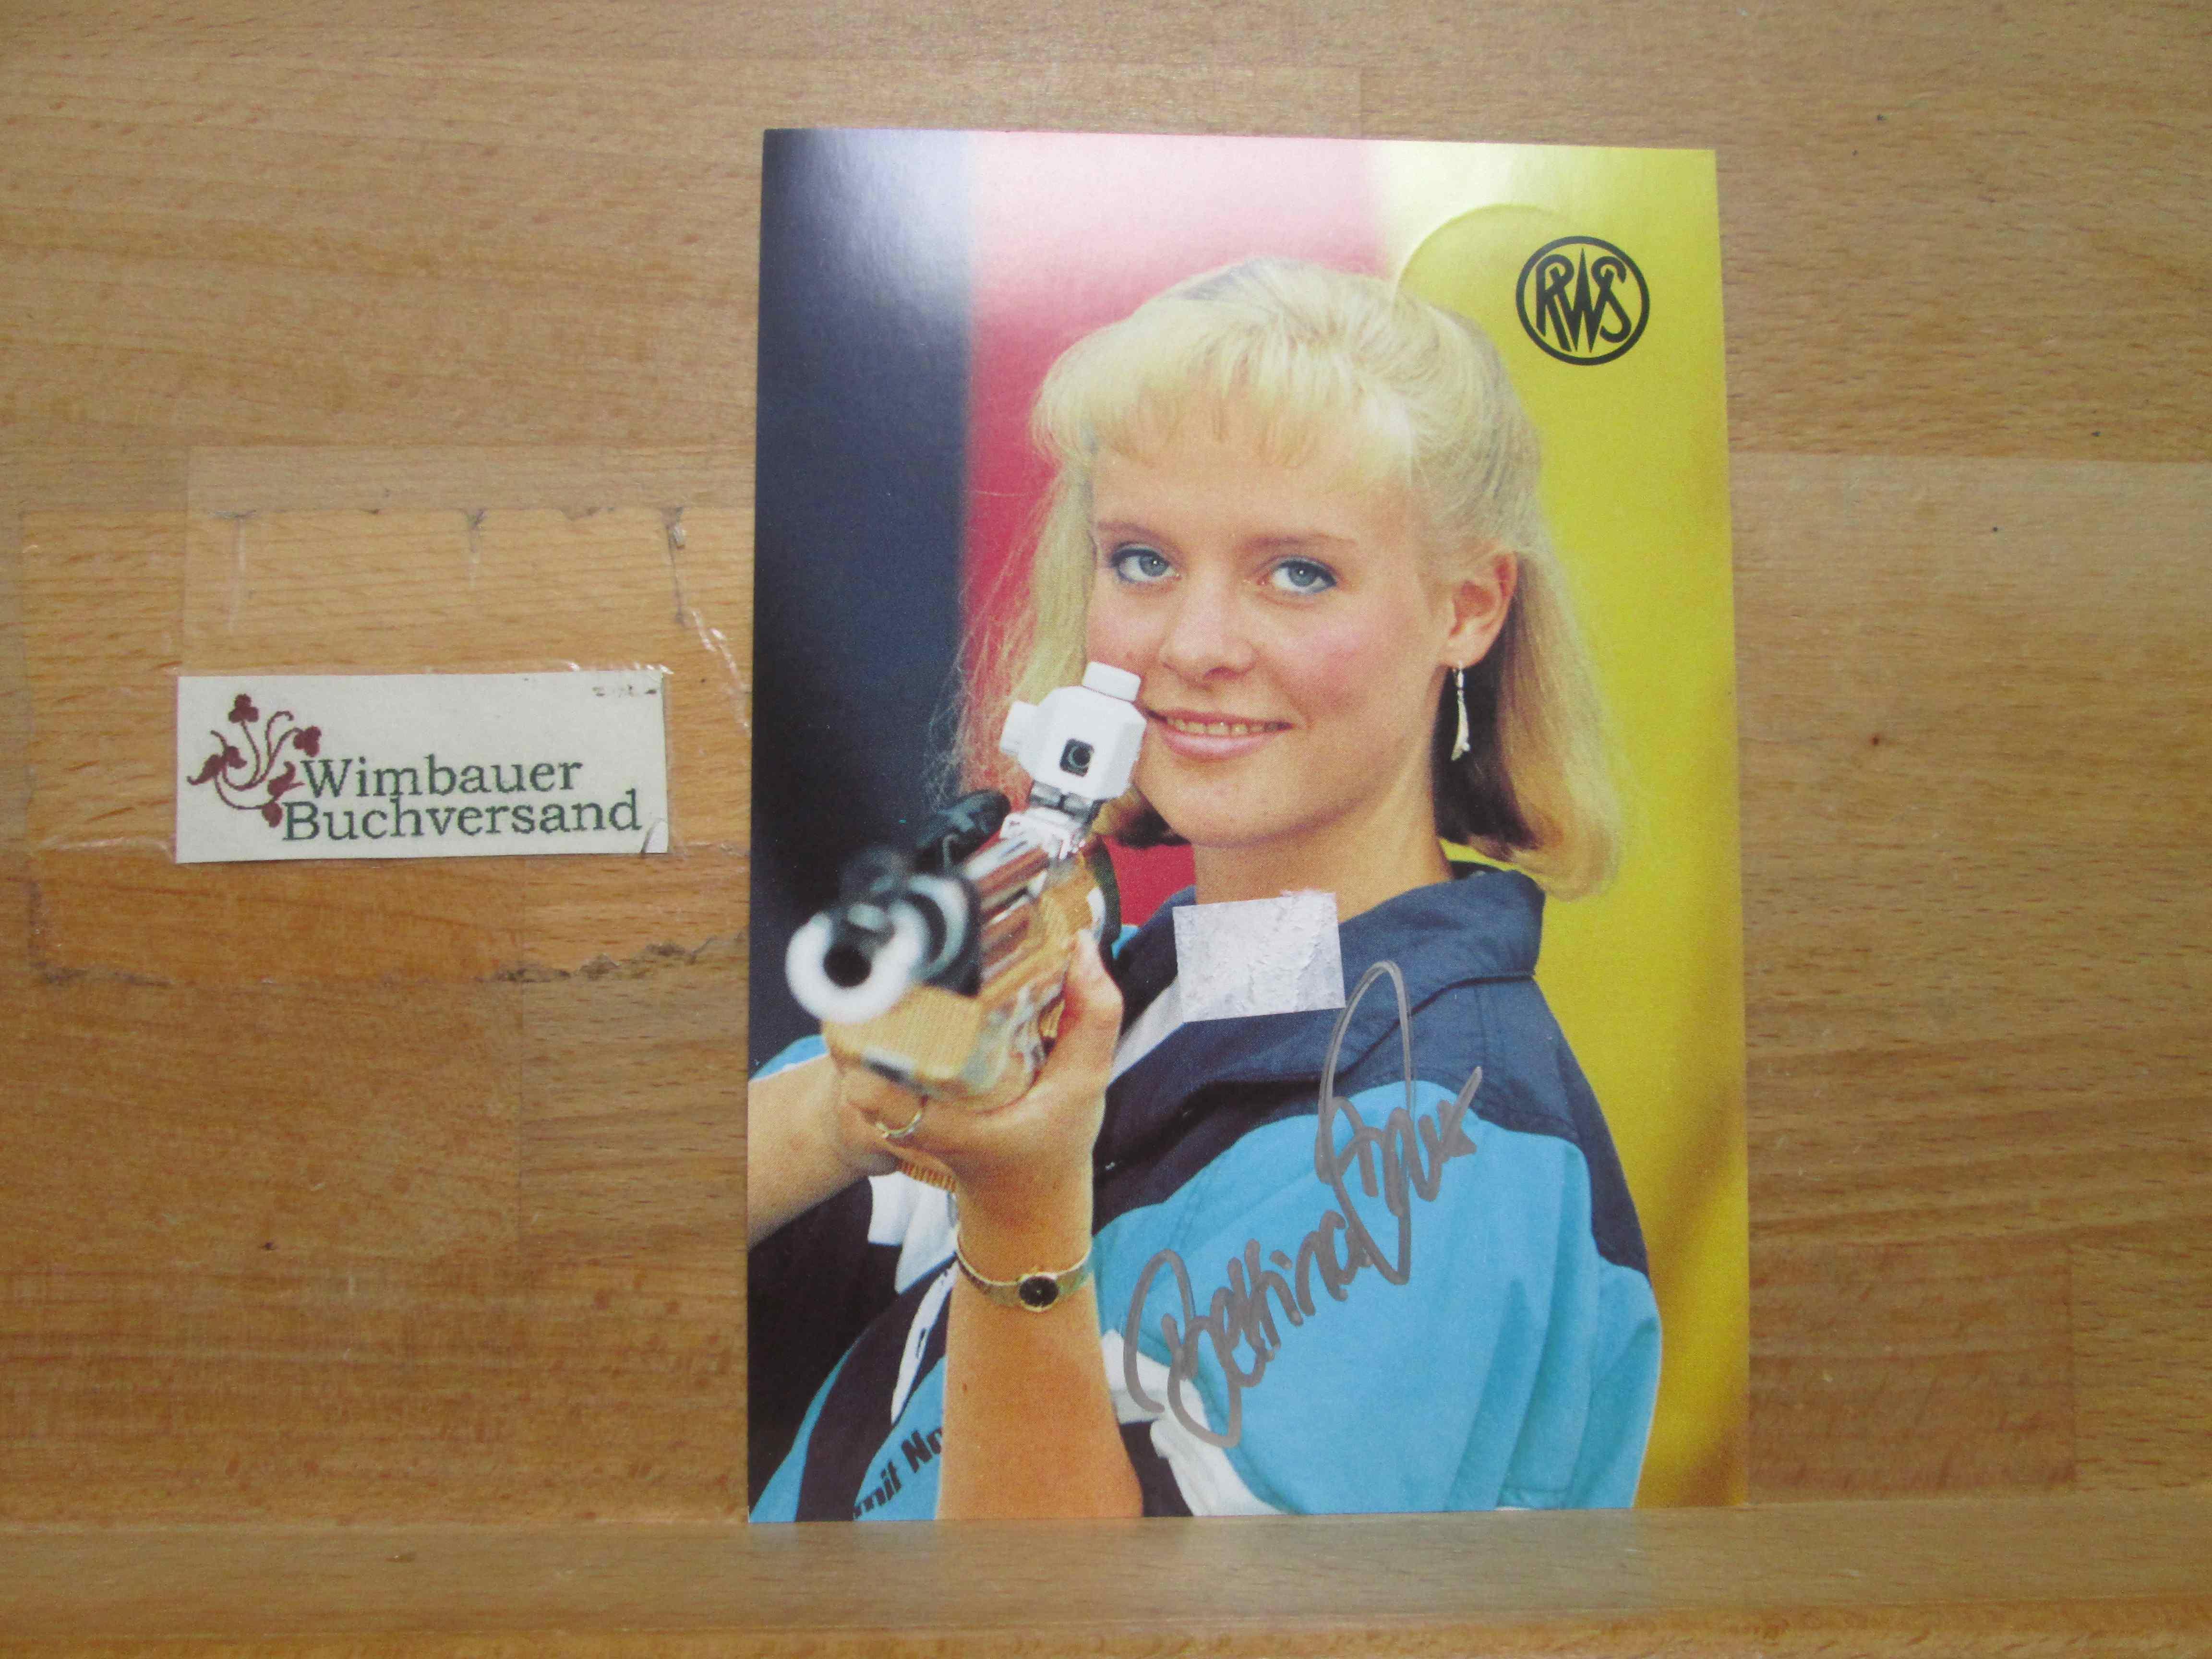 Original Autogramm Bettina Knells Olympia Sportschützin /// Autogramm Autograph signiert signed signee